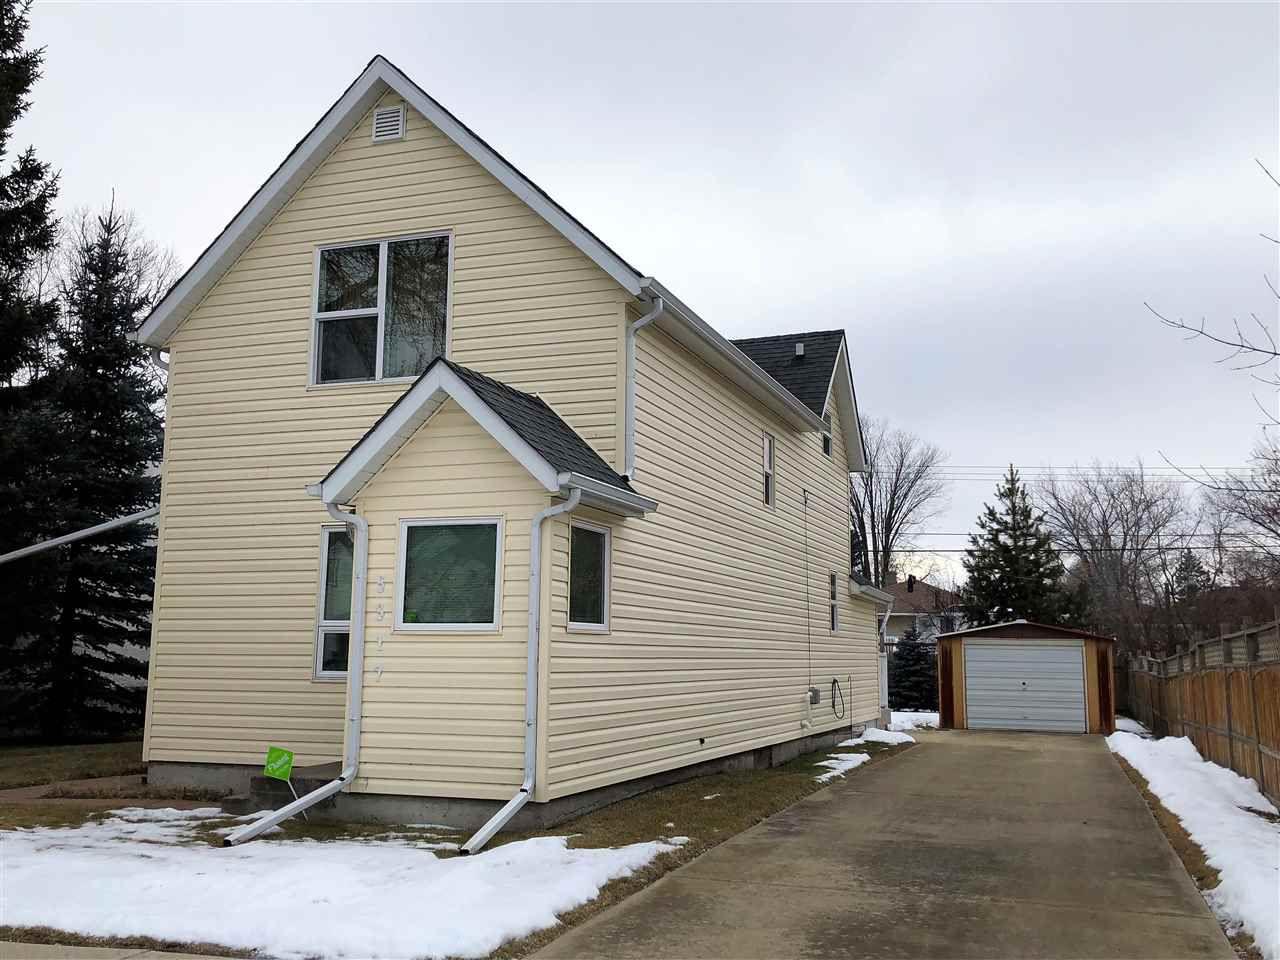 Main Photo: 5317 48 Avenue: Wetaskiwin House for sale : MLS®# E4136800